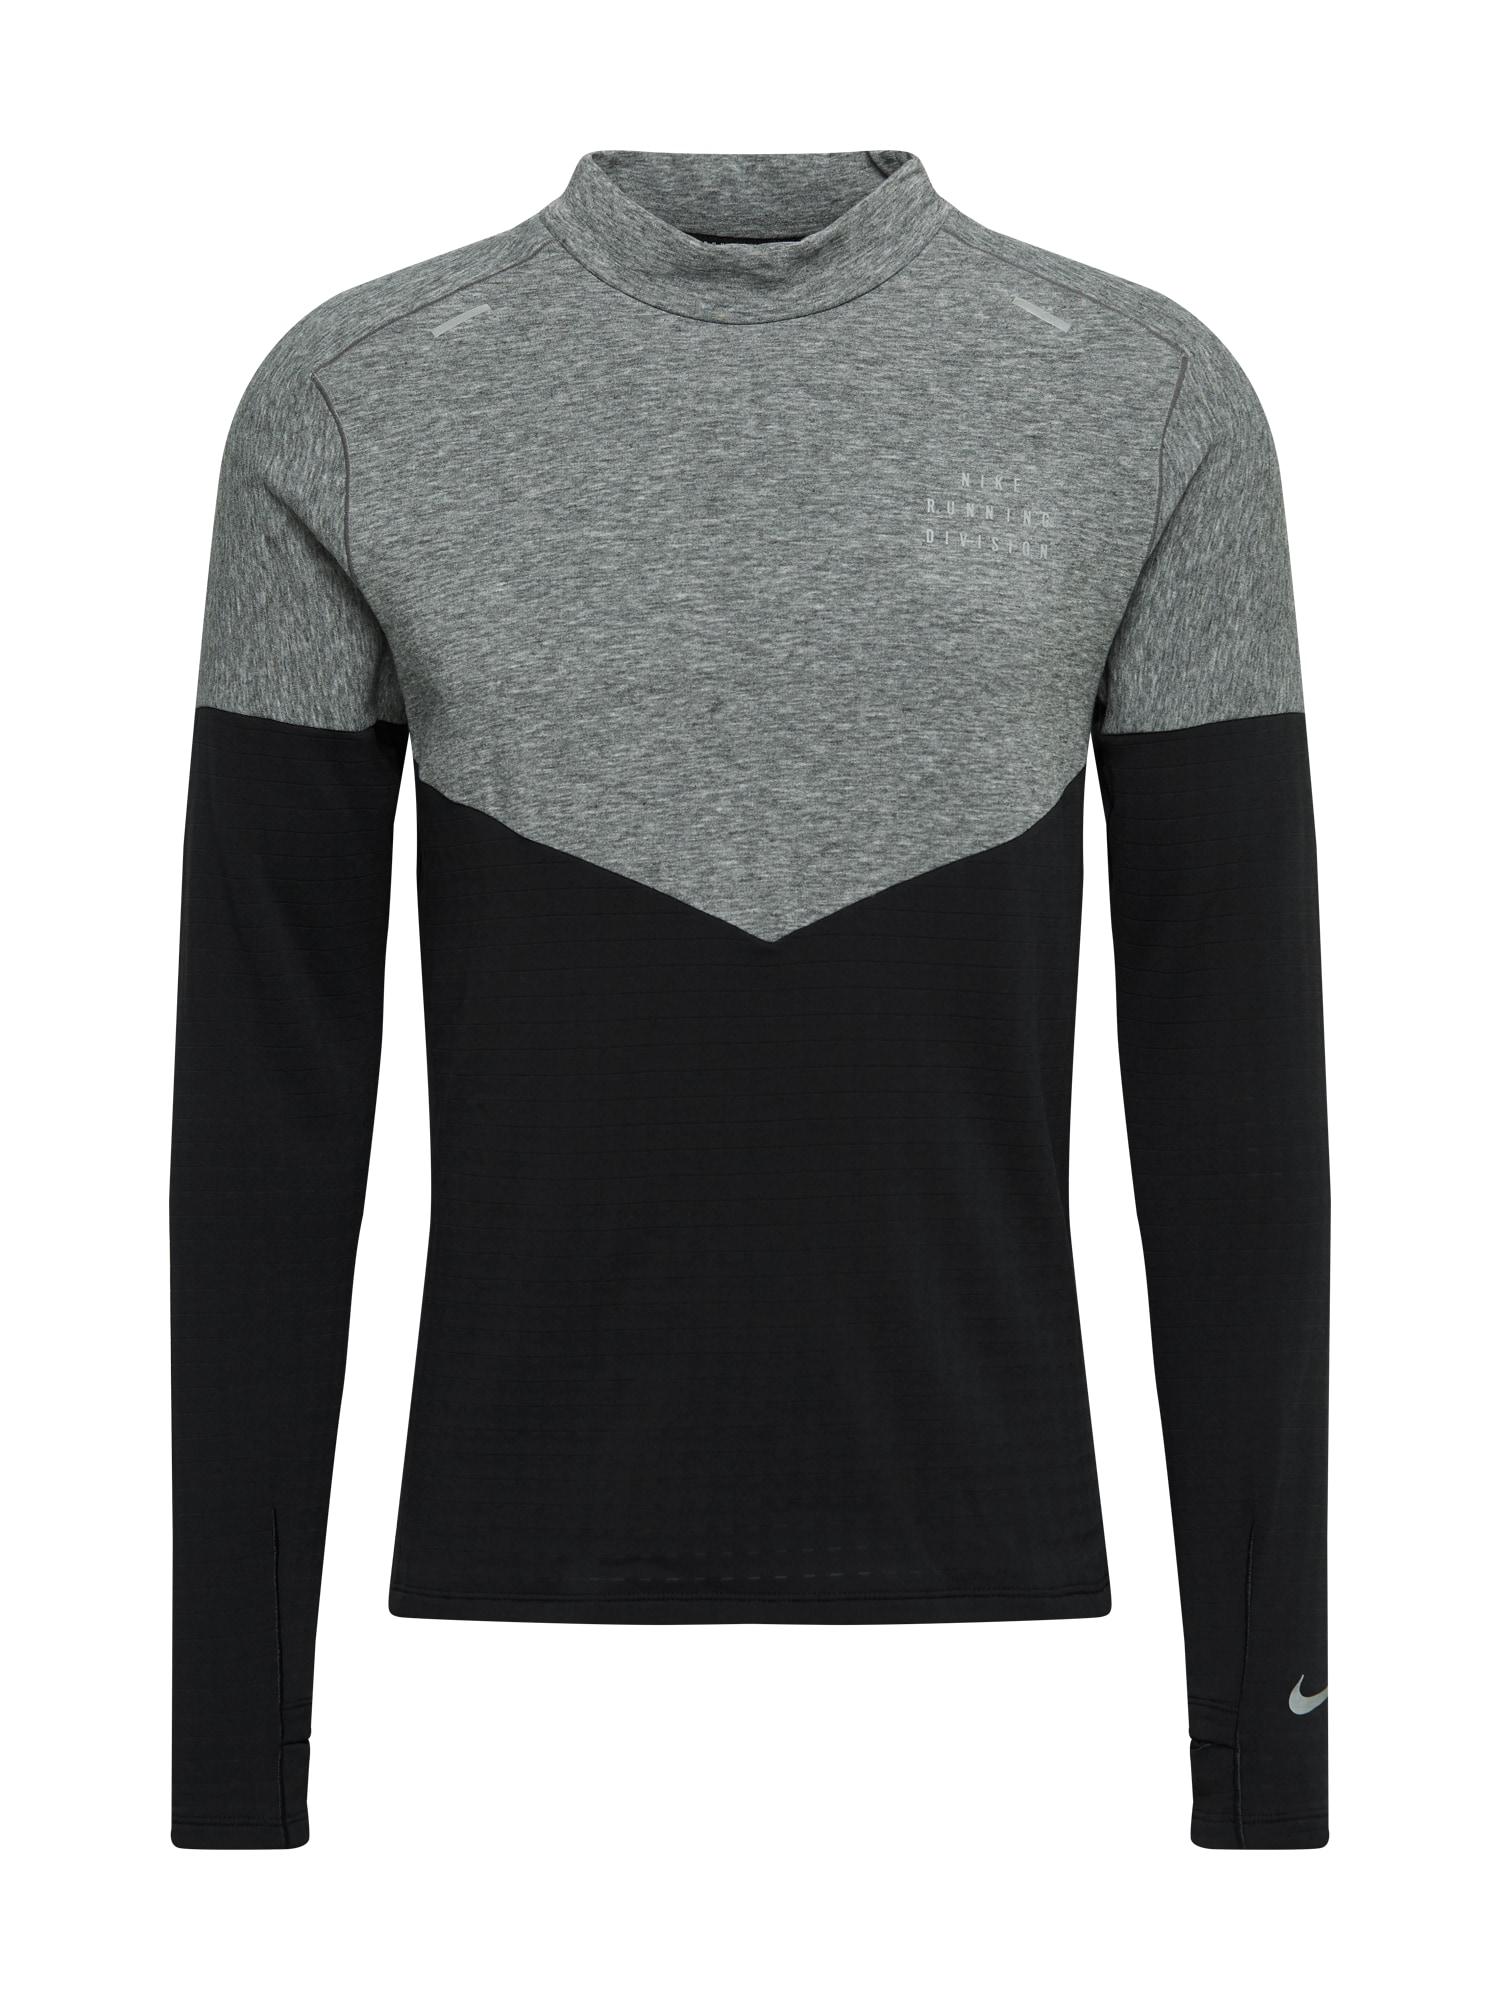 NIKE Sportinio tipo megztinis 'Sphere Run Division' juoda / margai pilka